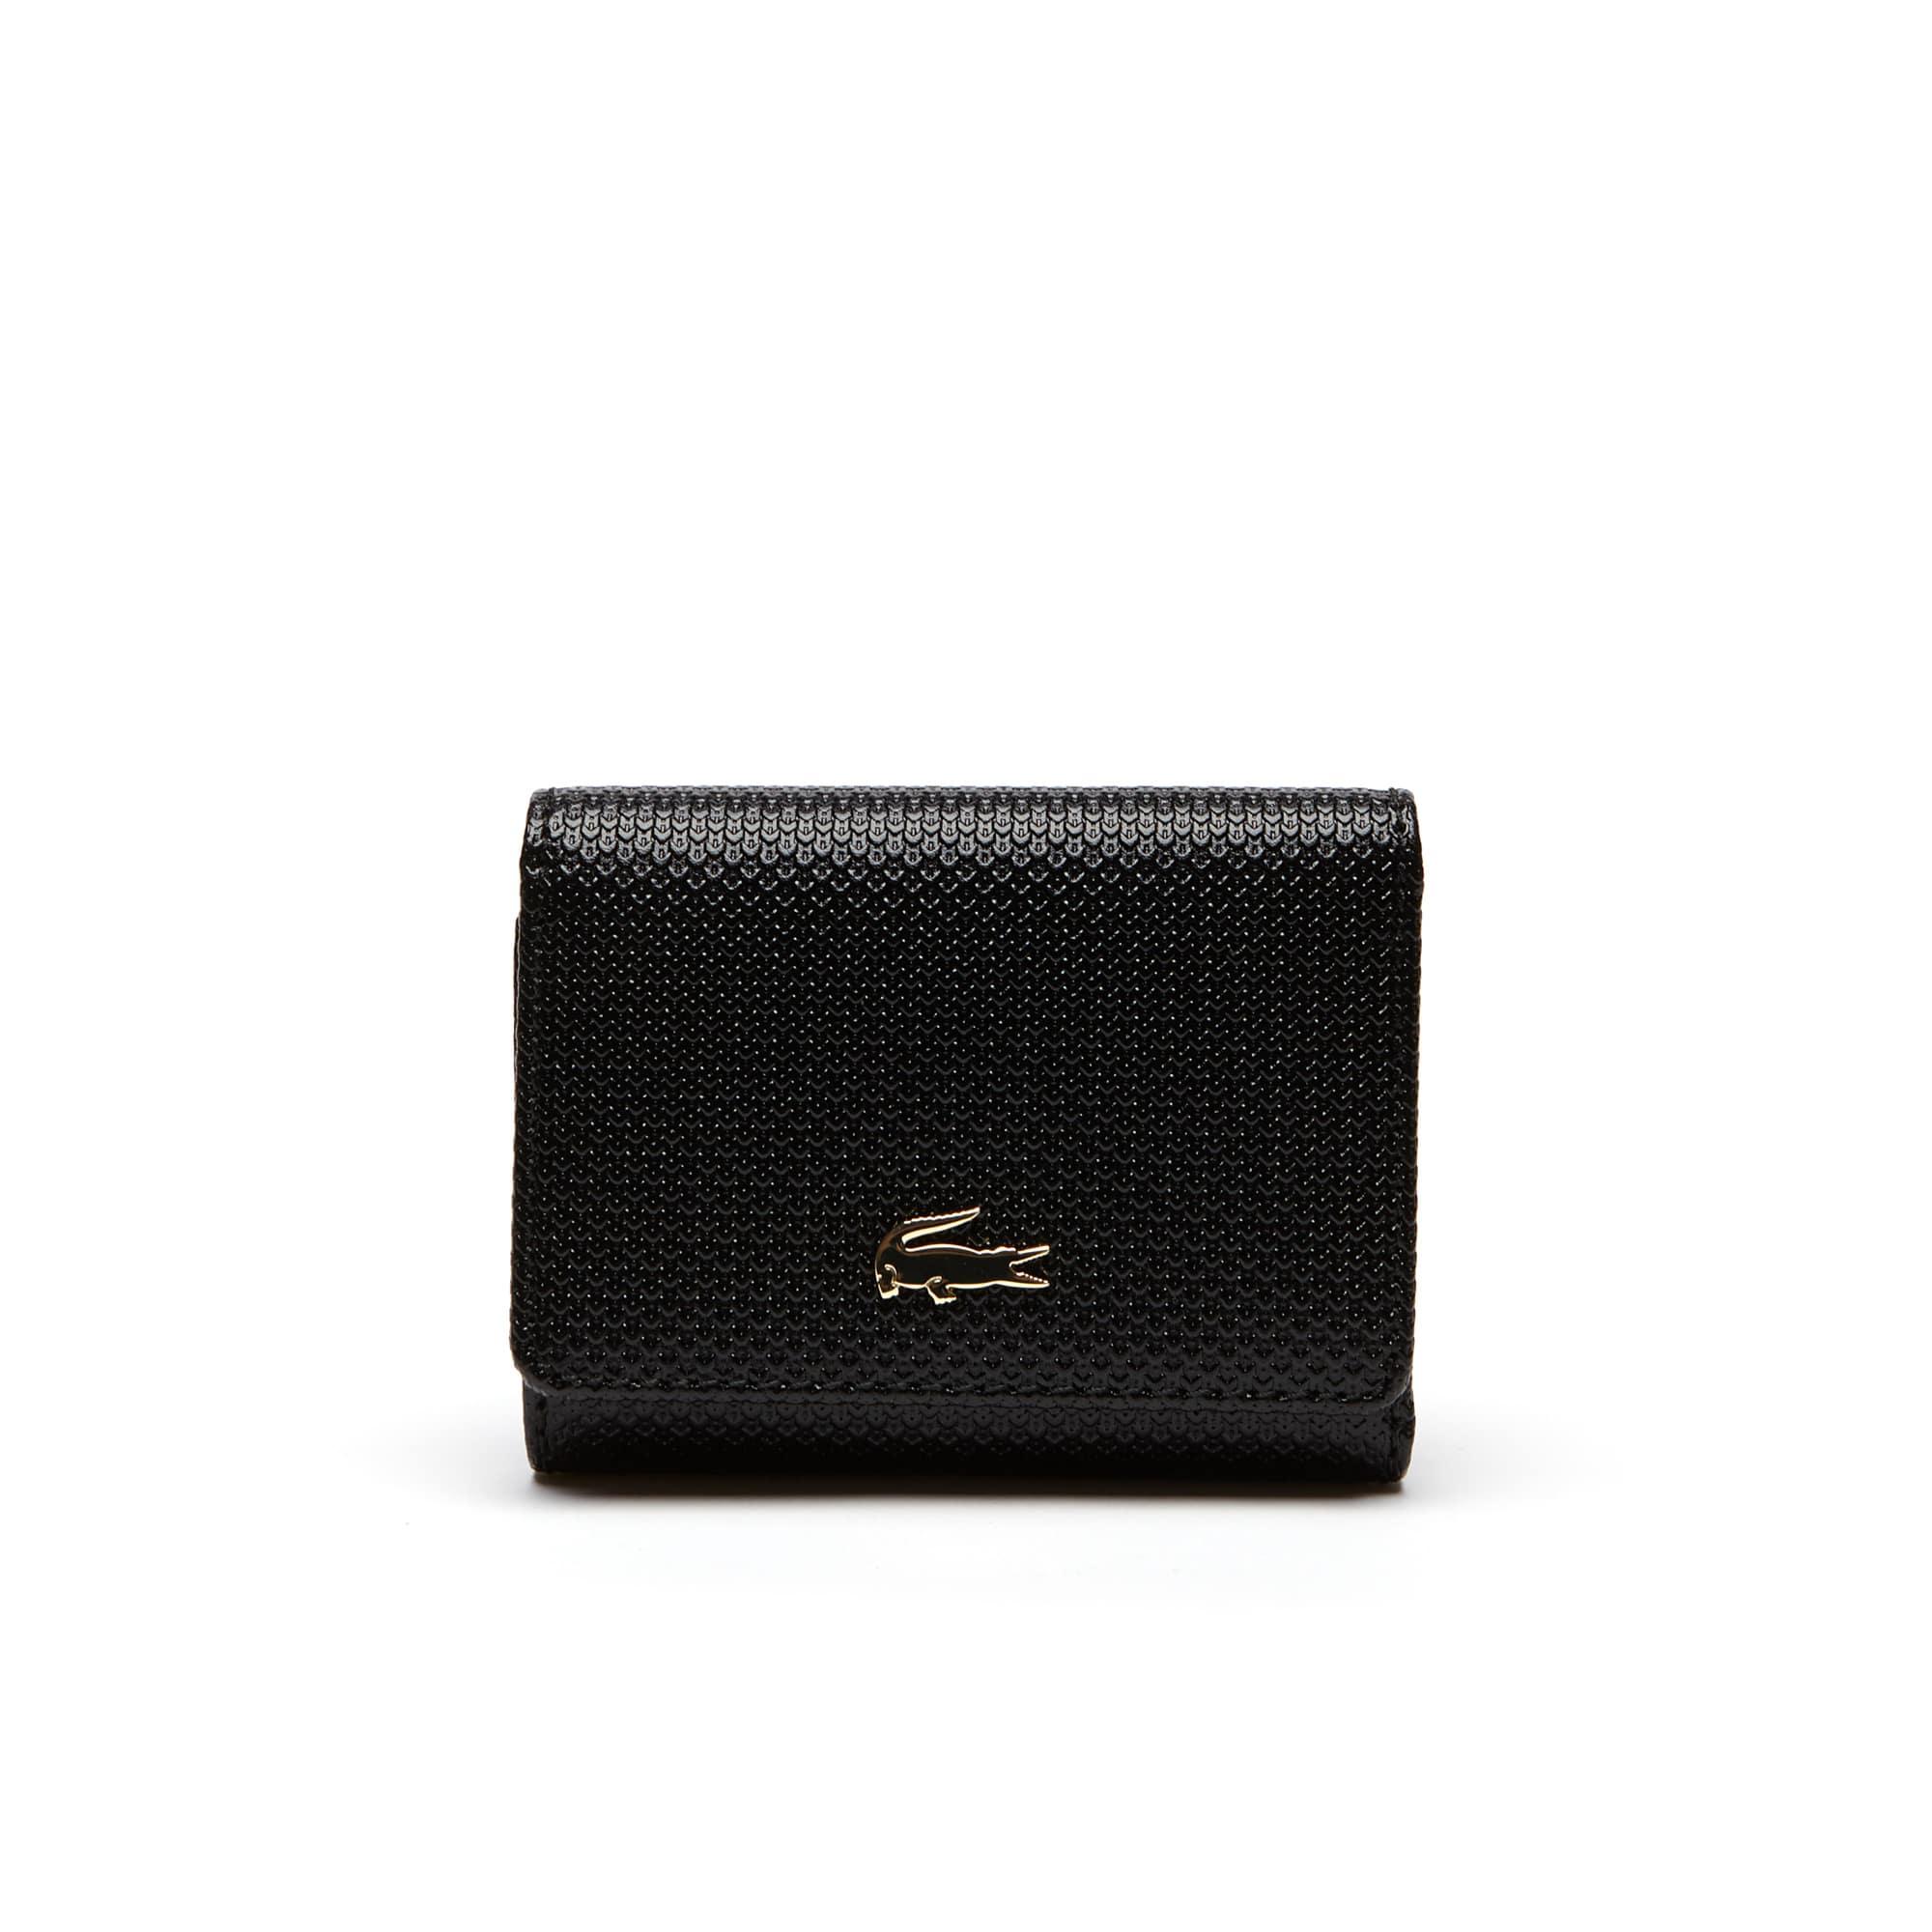 122c084d7d Women's Wallet and Phone Cases | Accessories | LACOSTE